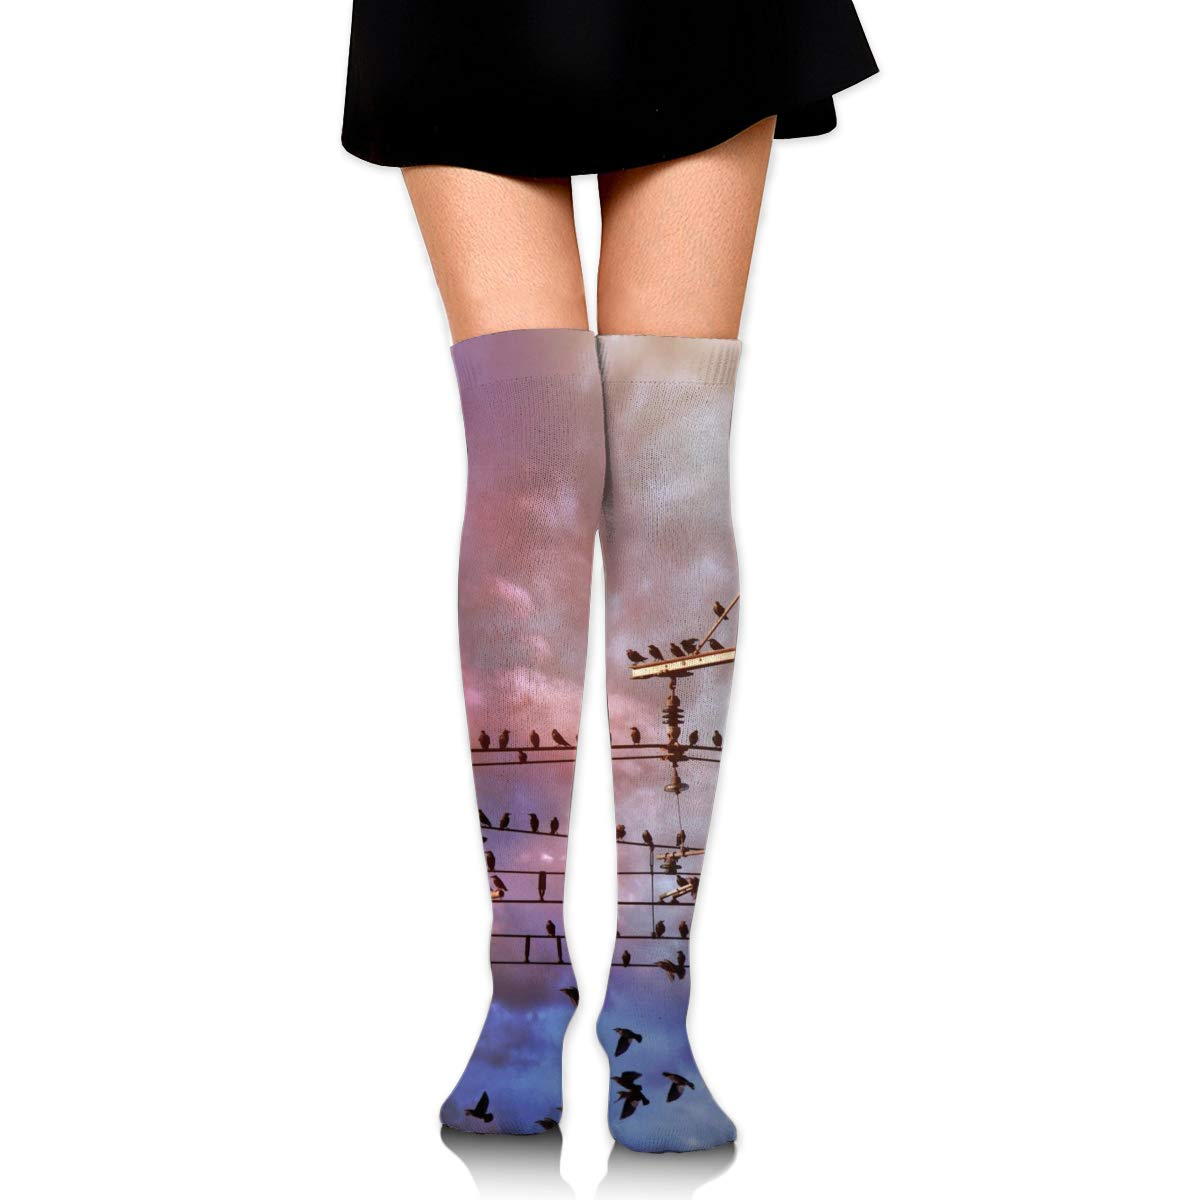 High Elasticity Girl Cotton Knee High Socks Uniform Cable Rod Birds Women Tube Socks